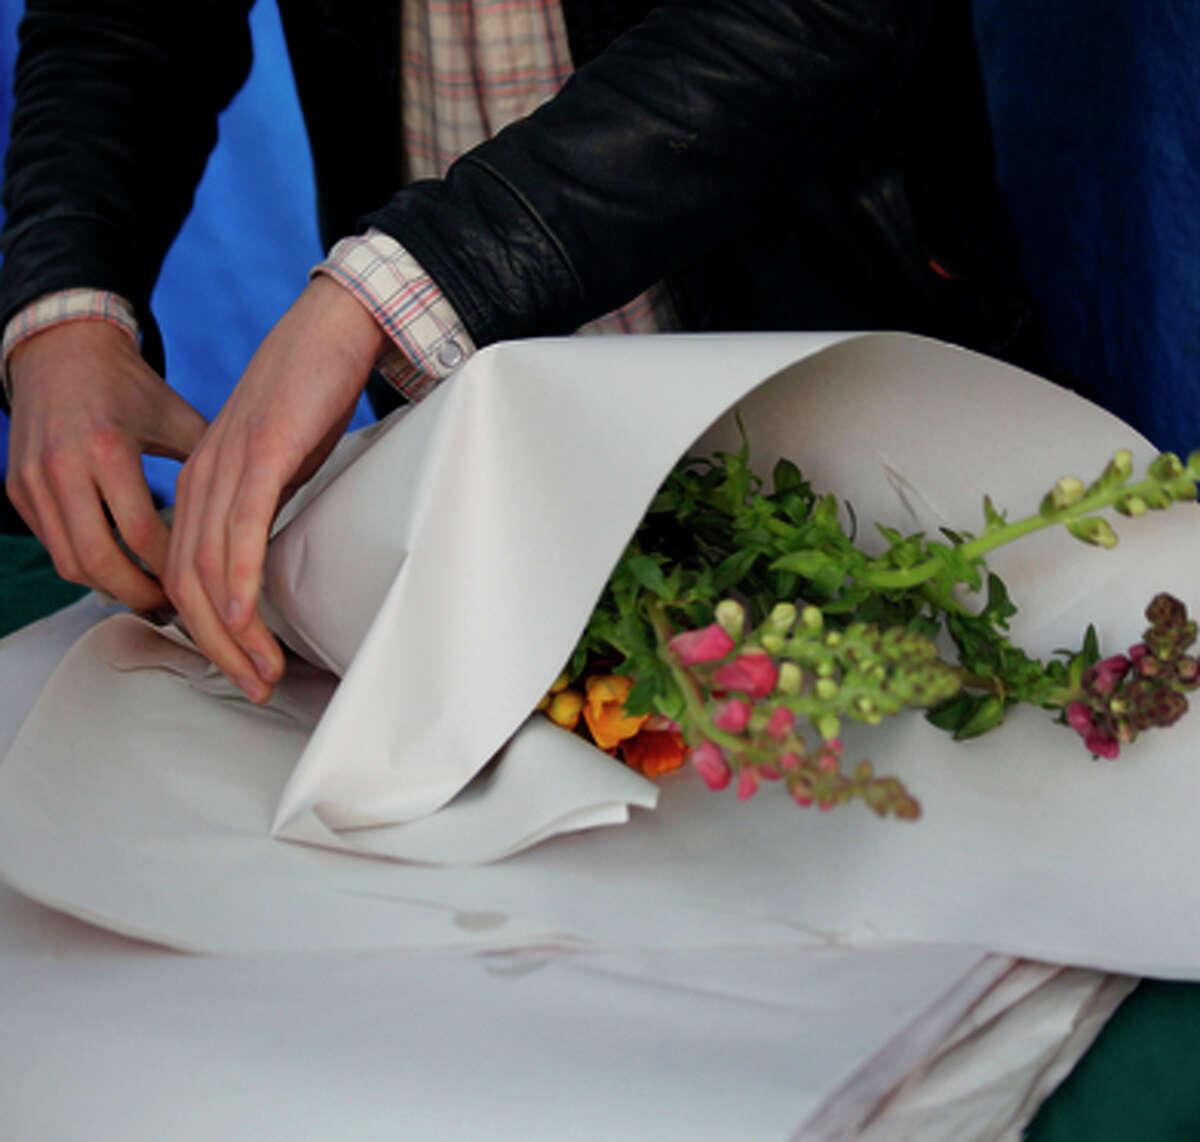 Rudy's Flower & Giftshop 4096 Main St, Bridgeport, CT 06606. (203) 372-2881